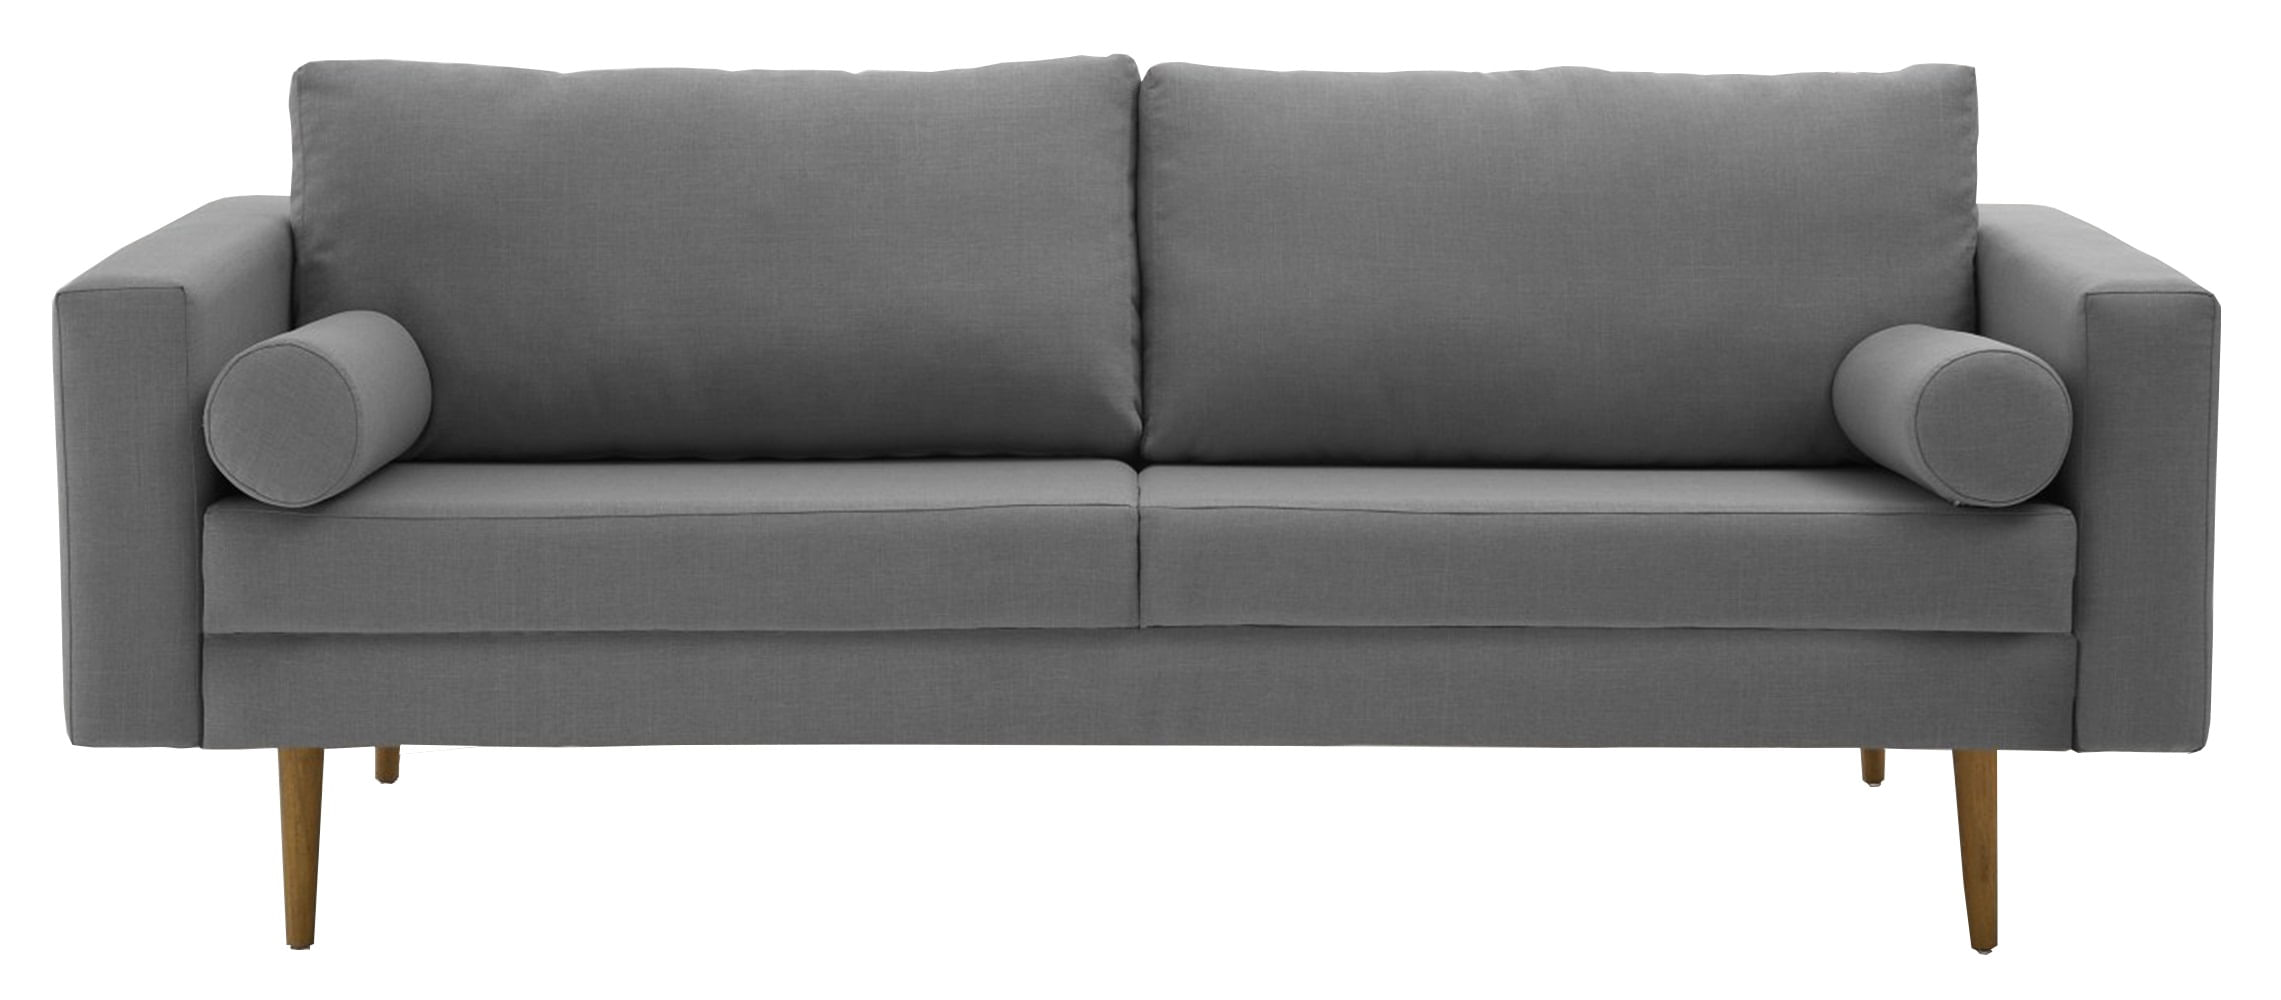 Sofa Rolls Cinza Base Castanho 2 Lugares - 50354